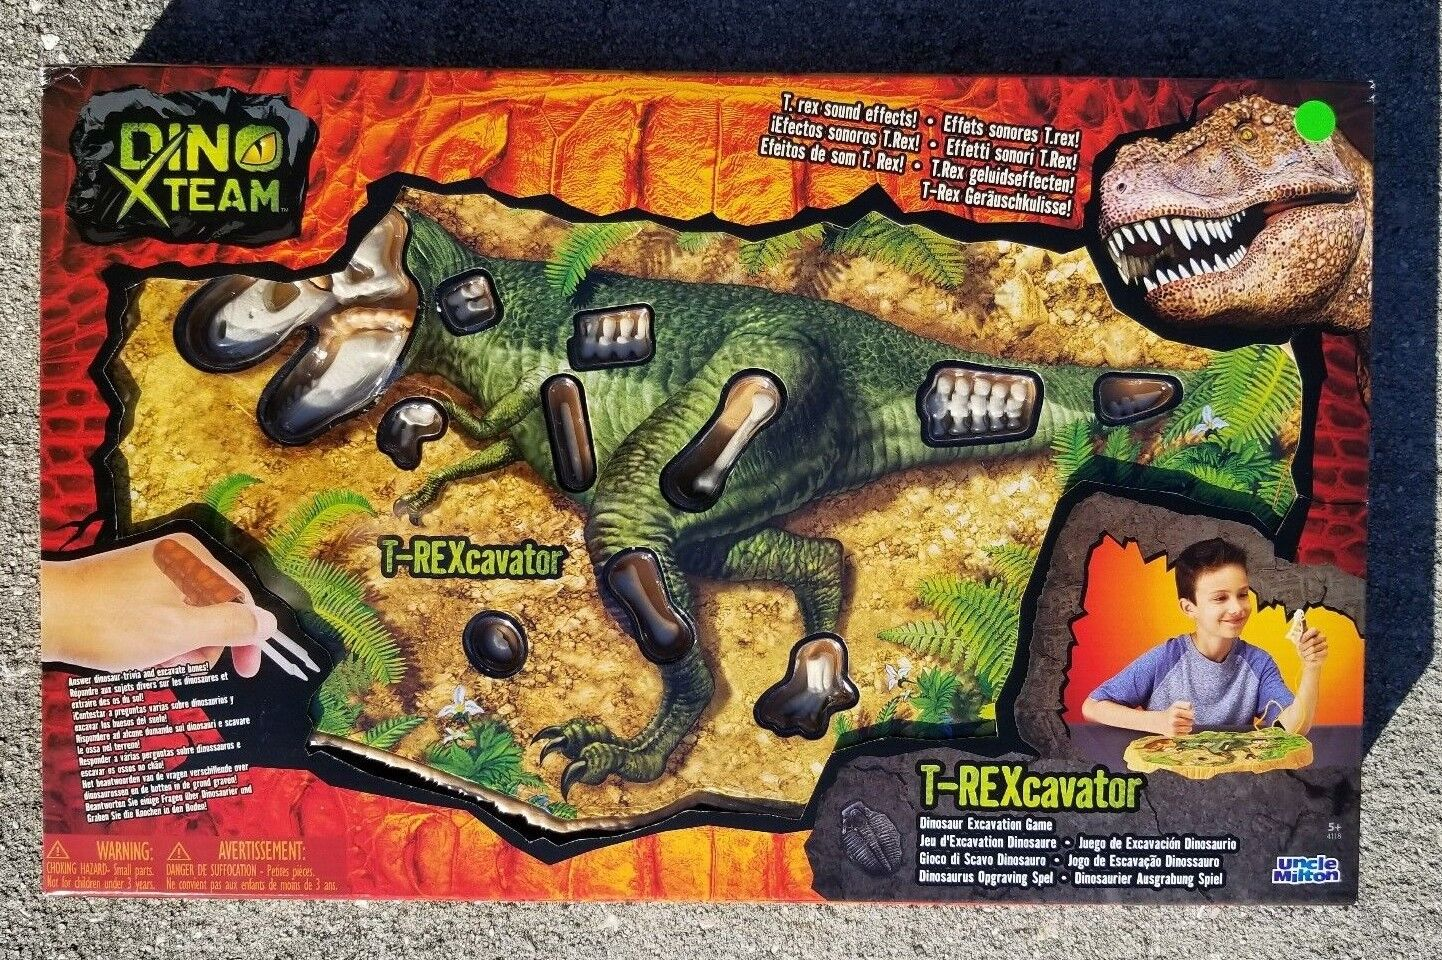 Uncle Milton Dino X-Team T-Rexcavator Game Dinosaur Sound Effects Like  Operation